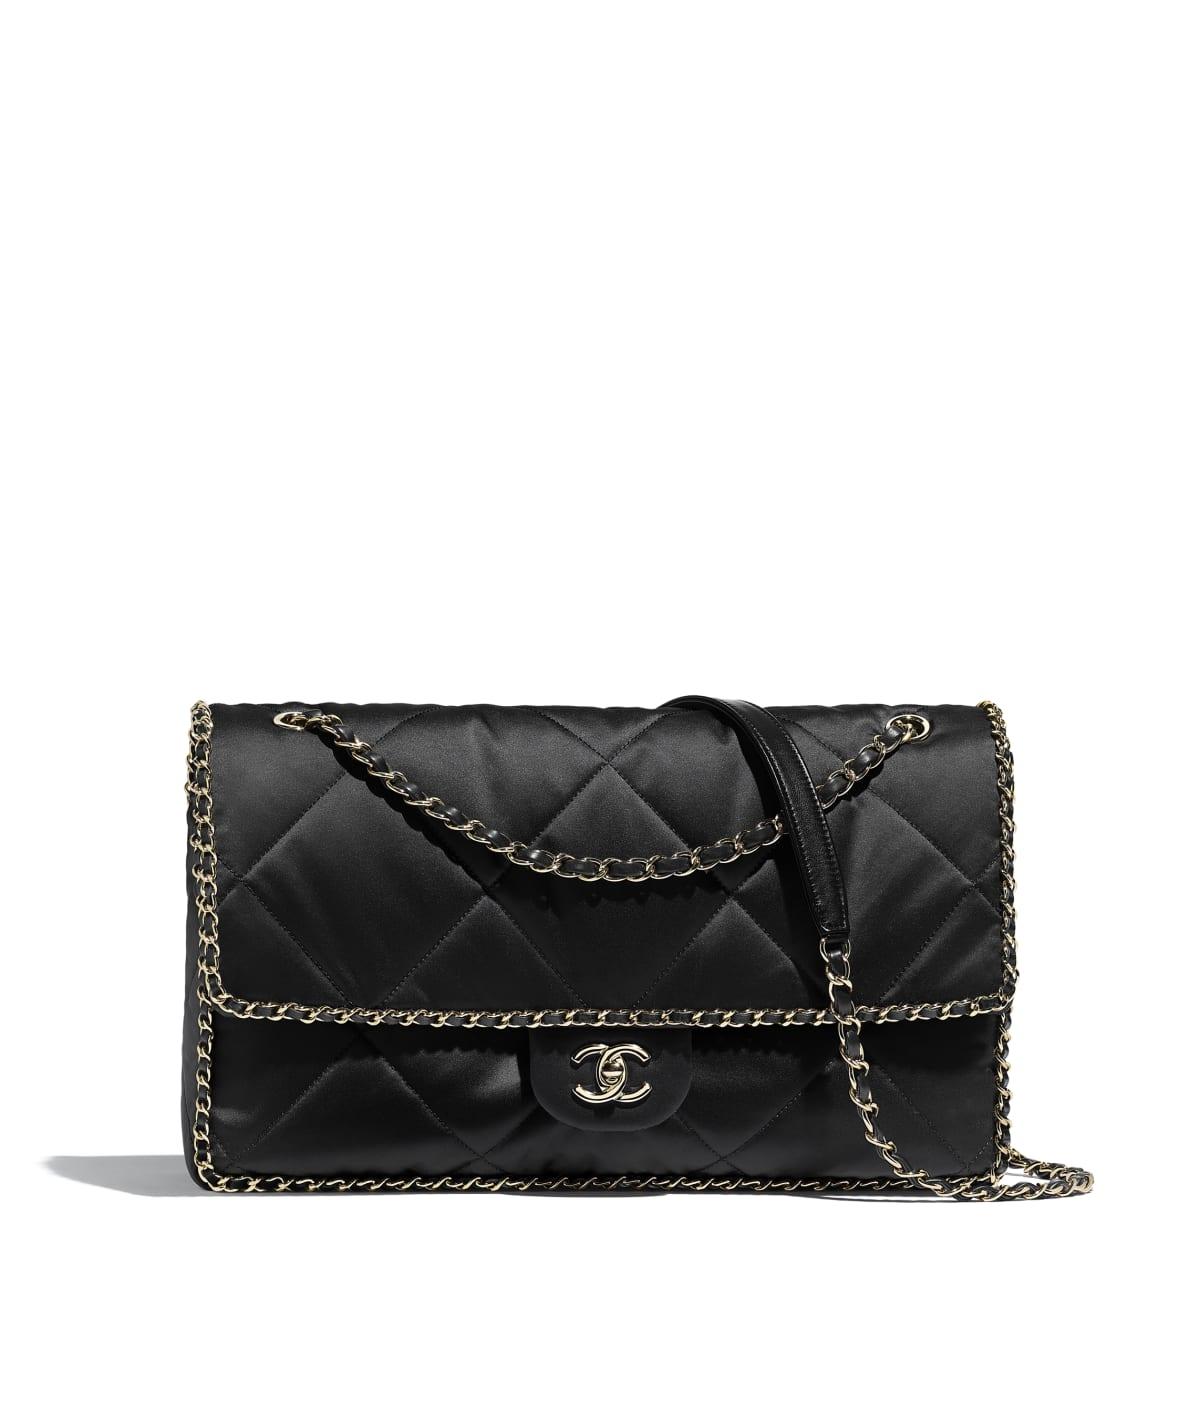 08b1d584 Handbags - CHANEL